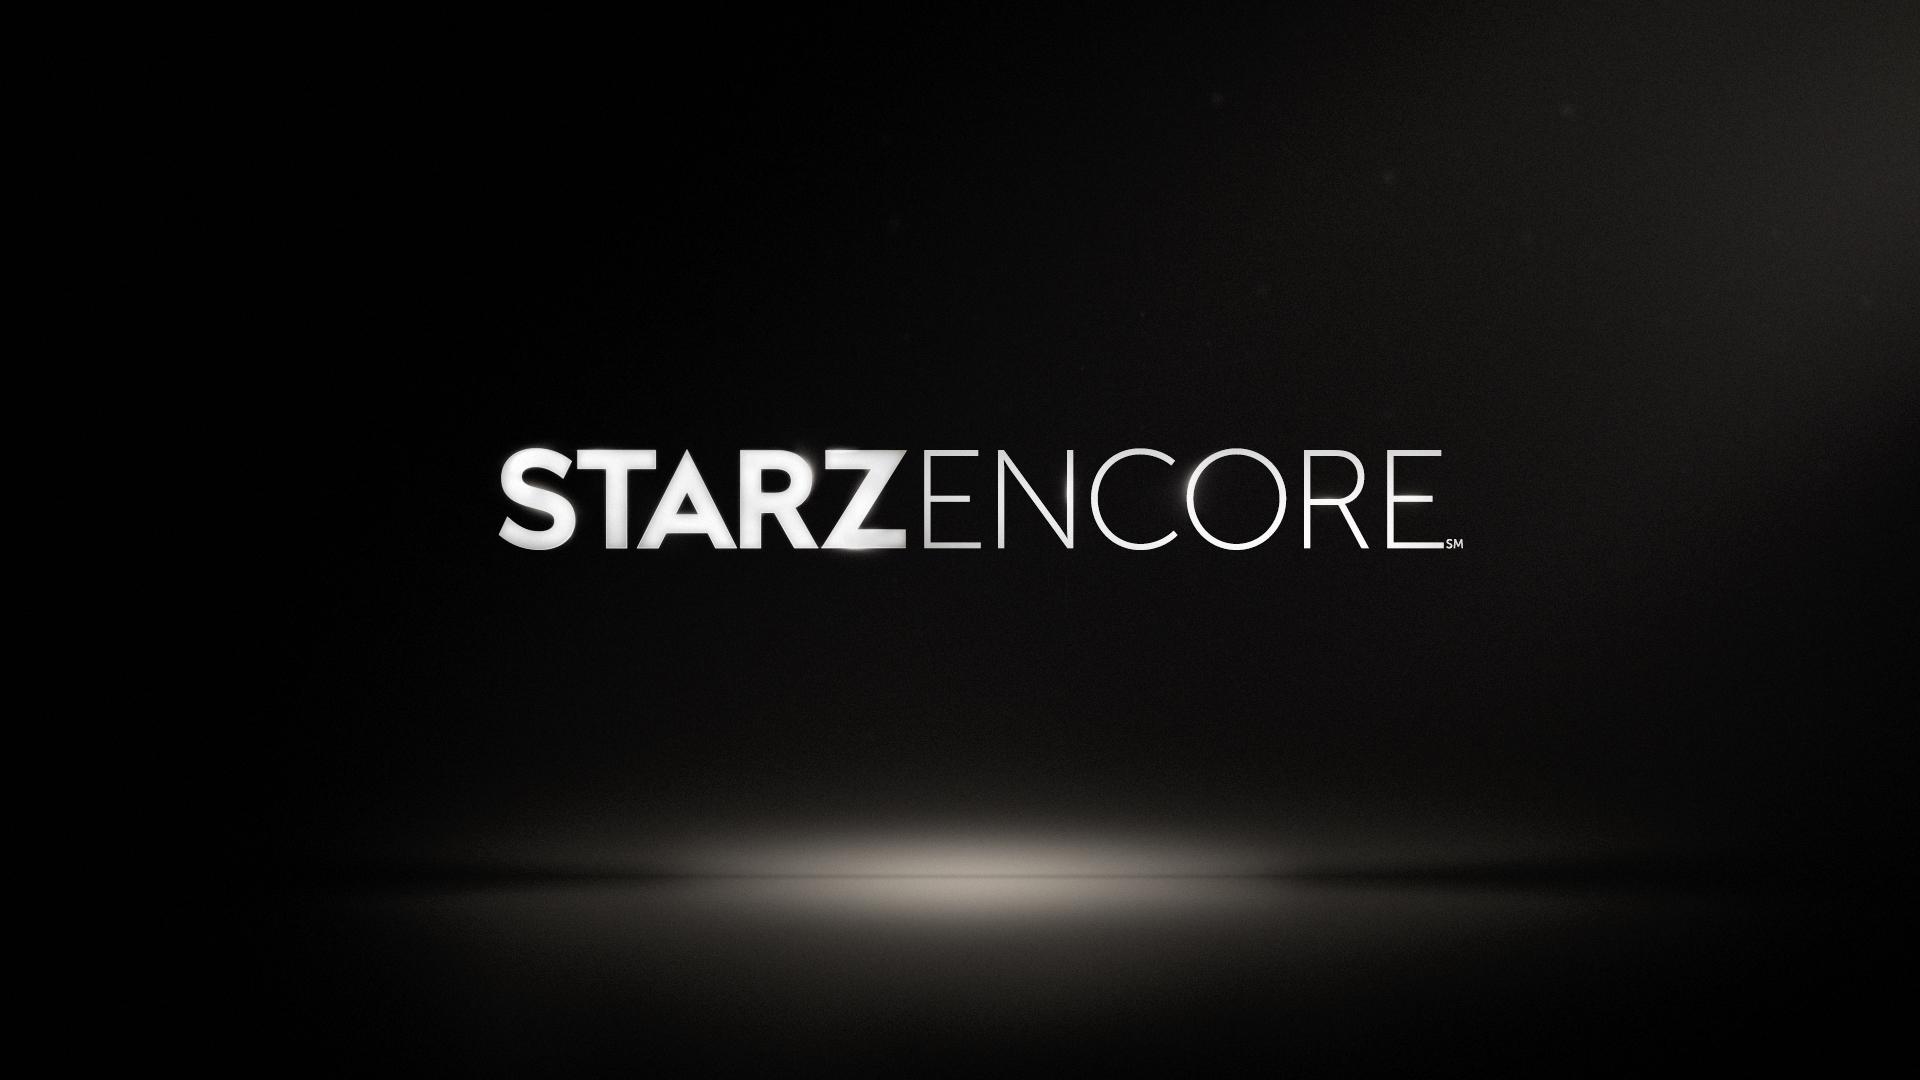 starz_encore_id